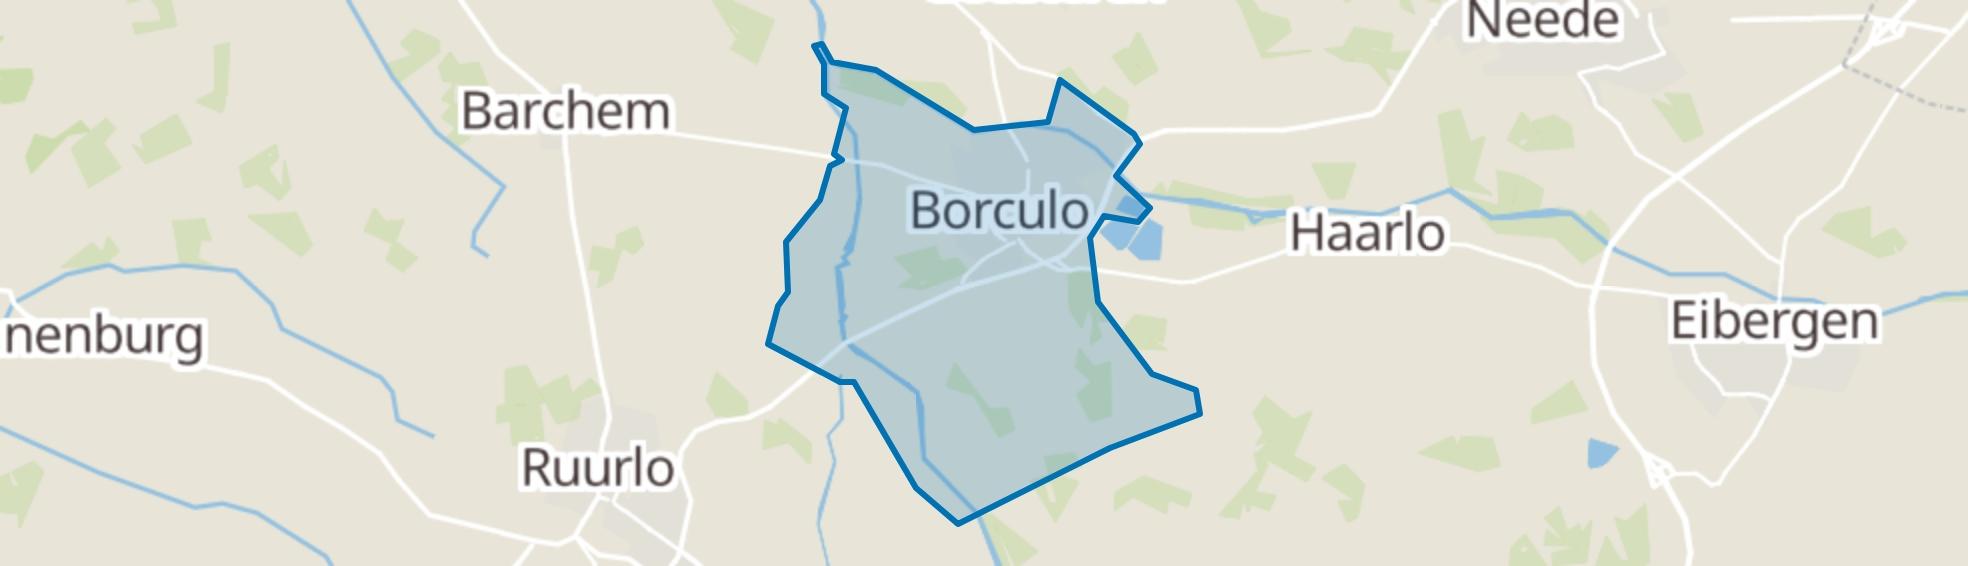 Borculo map